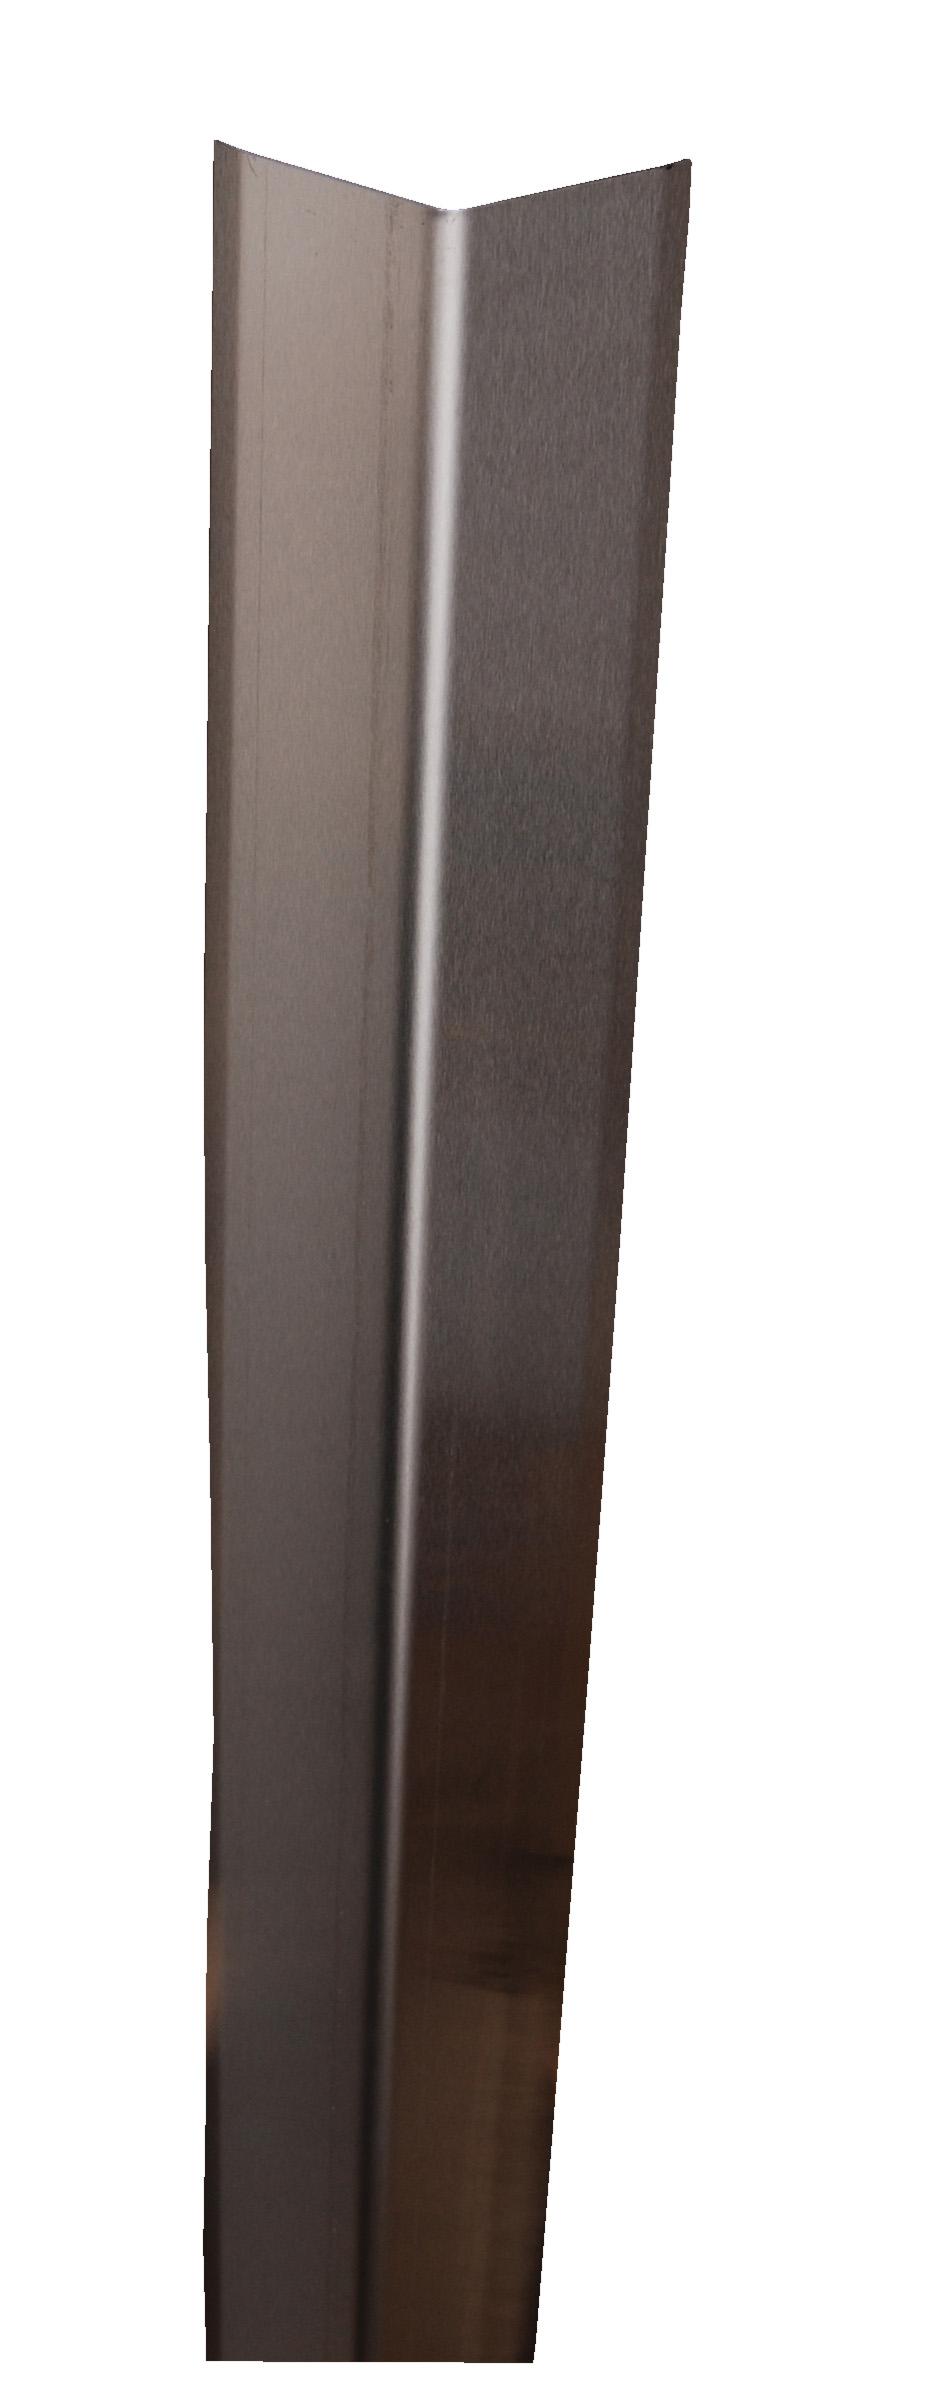 Column Protectors Amp Safety Rack Column Guards Material